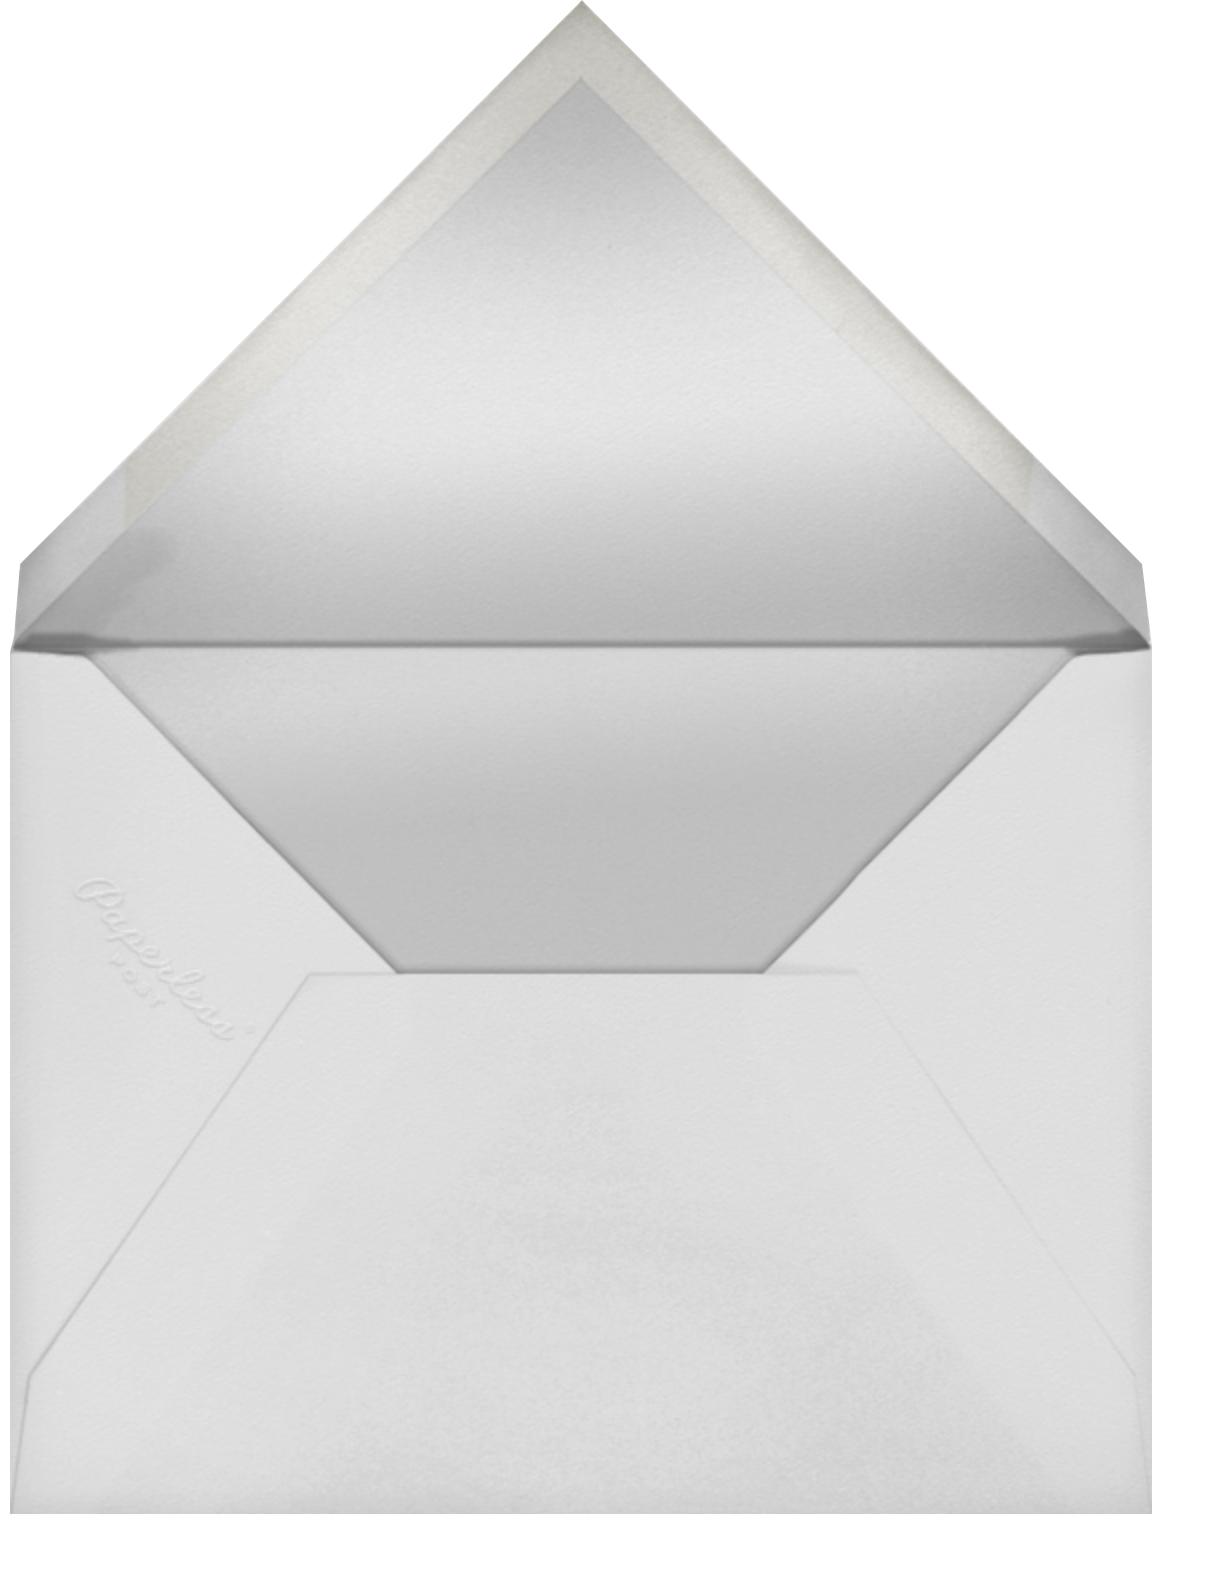 Dahlias (Program) - Pumpkin - Paperless Post - Menus and programs - envelope back